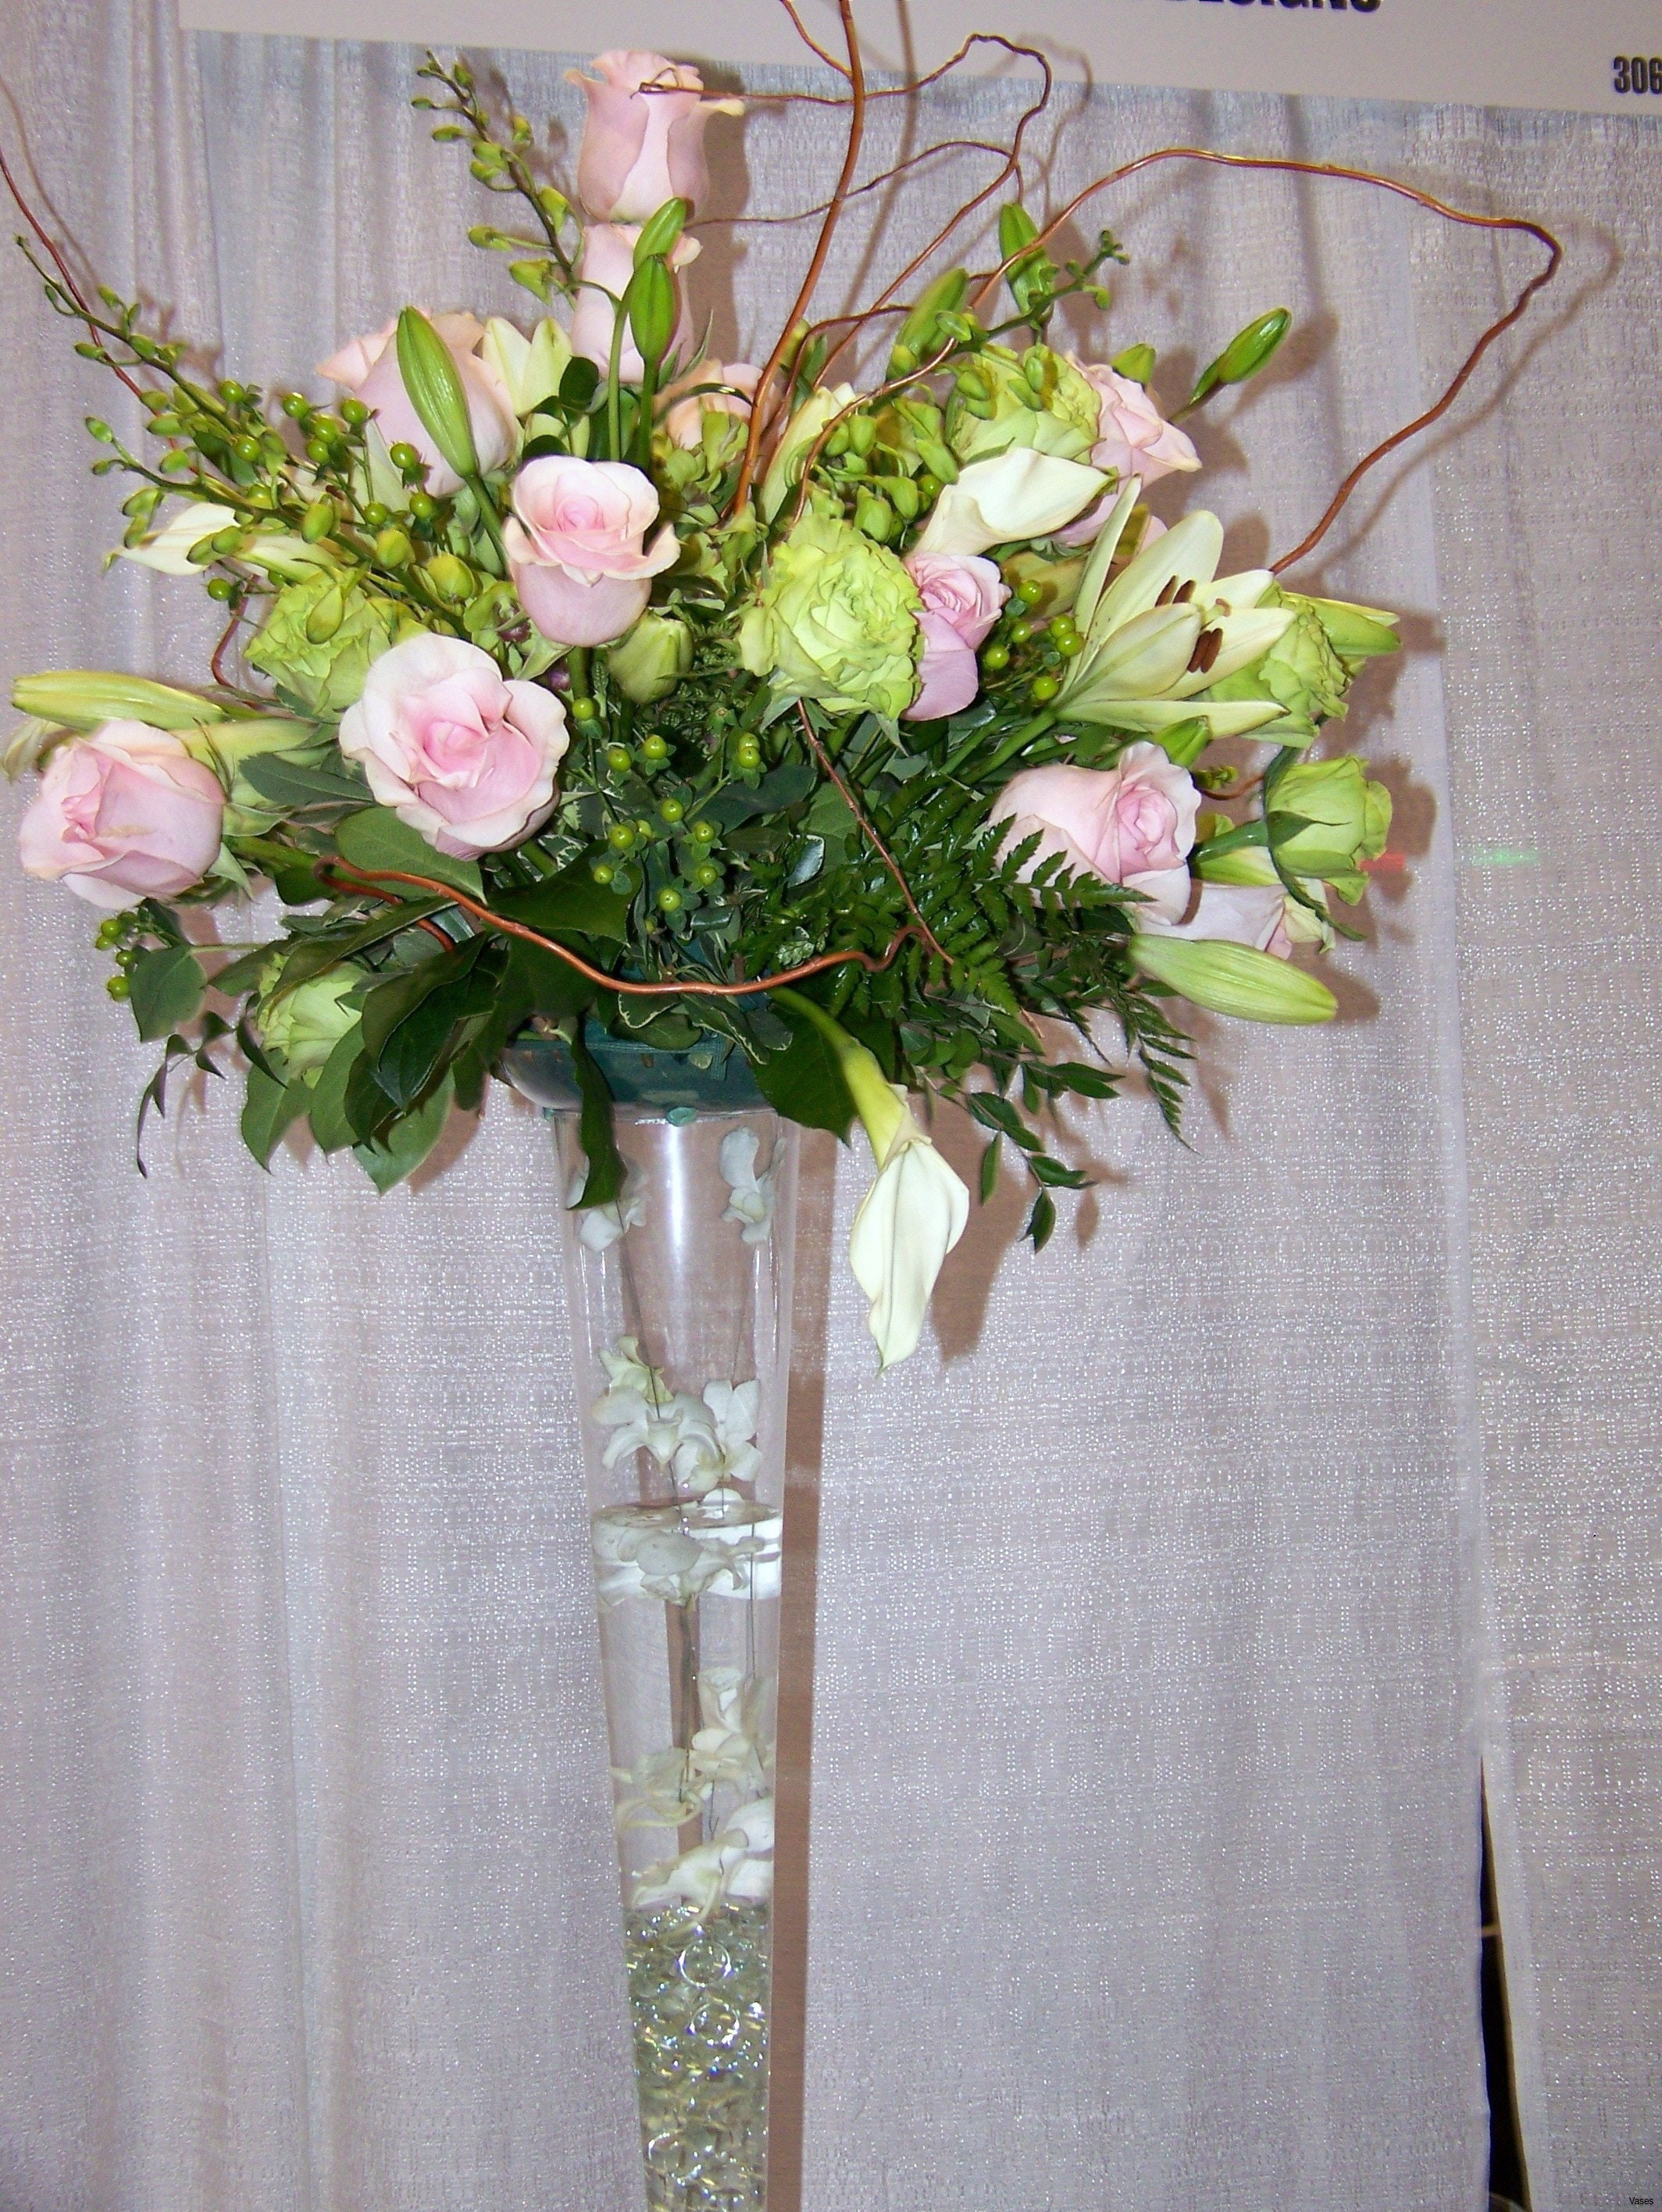 Flower Arrangements A Bud Elegant Wedding Decoration Ideas Bud Amazing H Vases Ideas for Floral